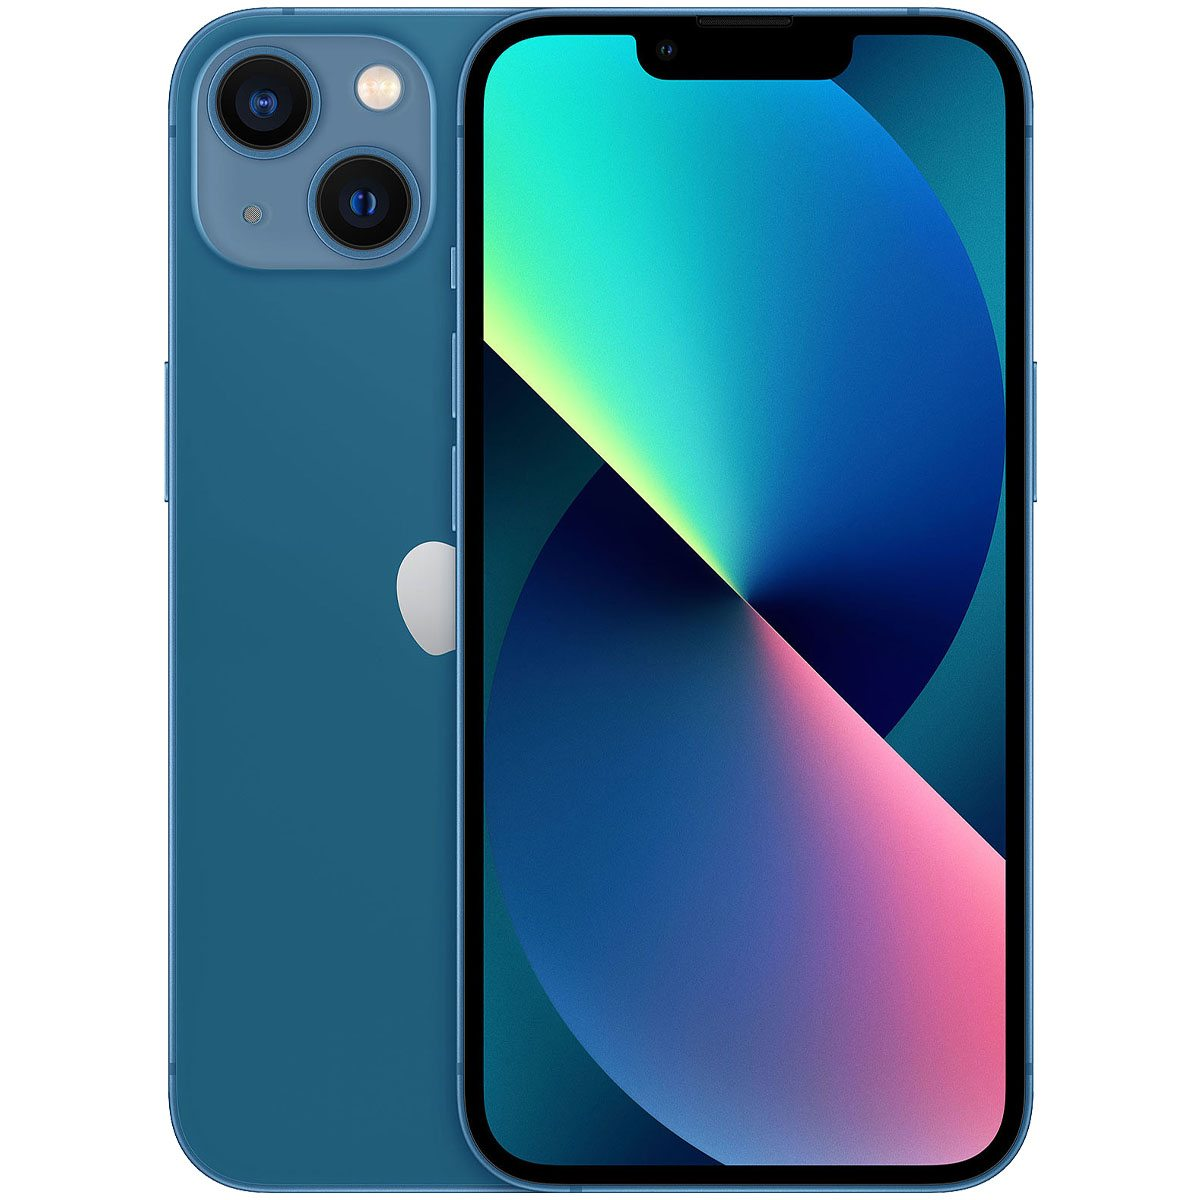 iPhone 13 Apple, Super Retina XDR, Tela 6.1